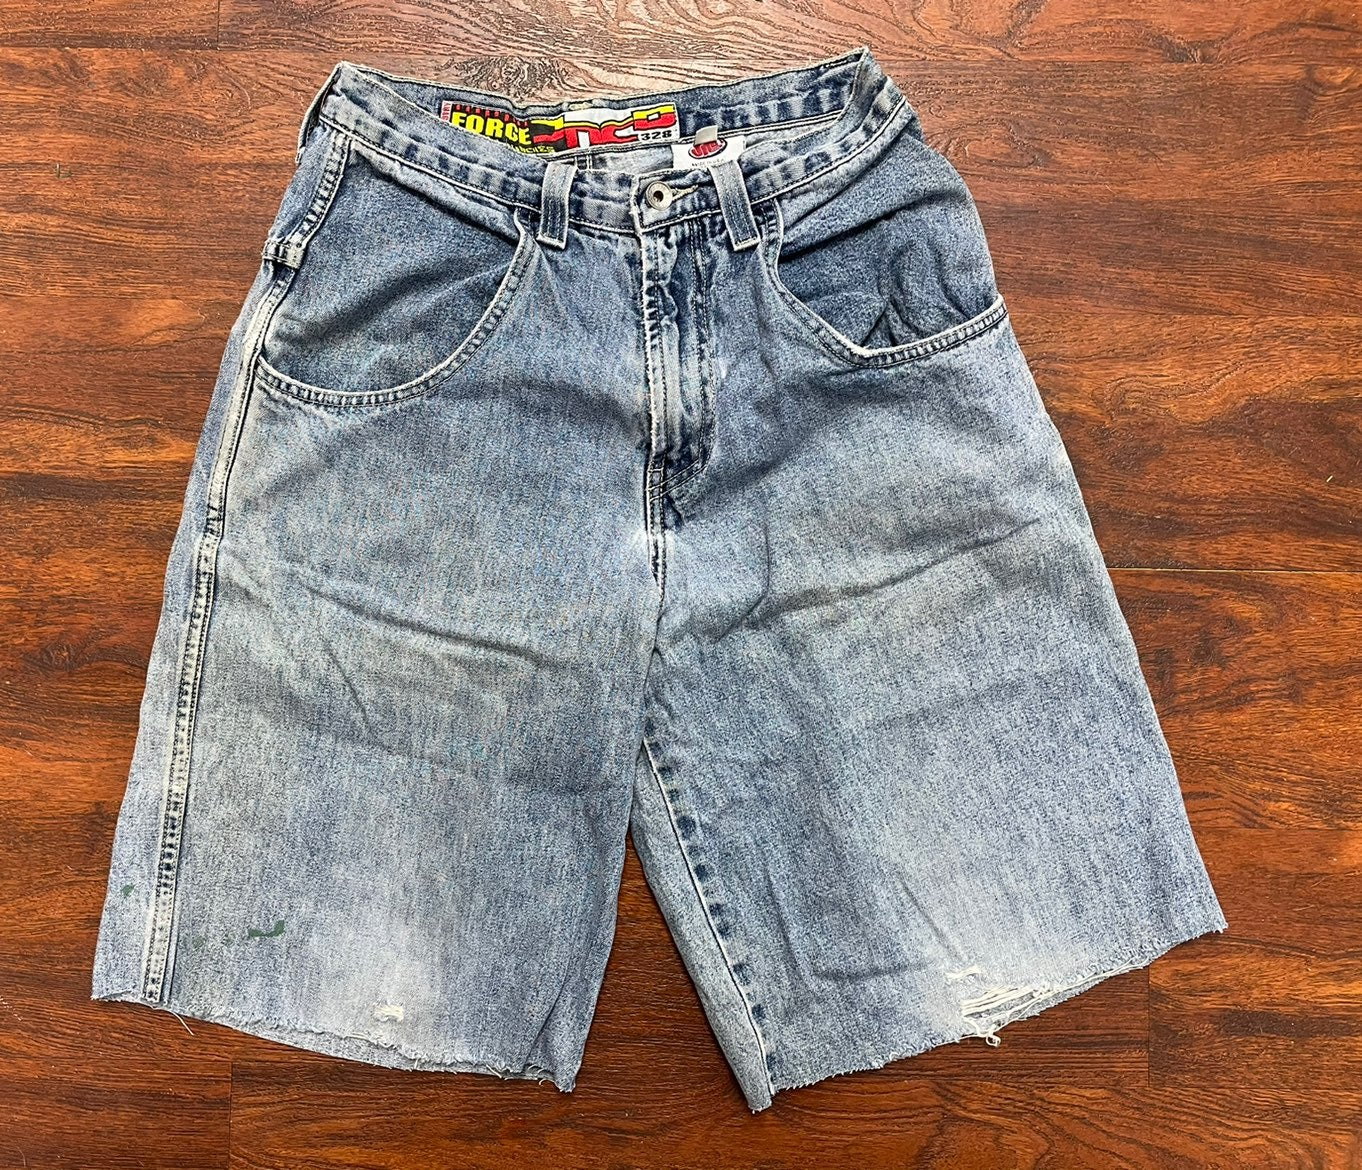 Jnco jean shorts size 30